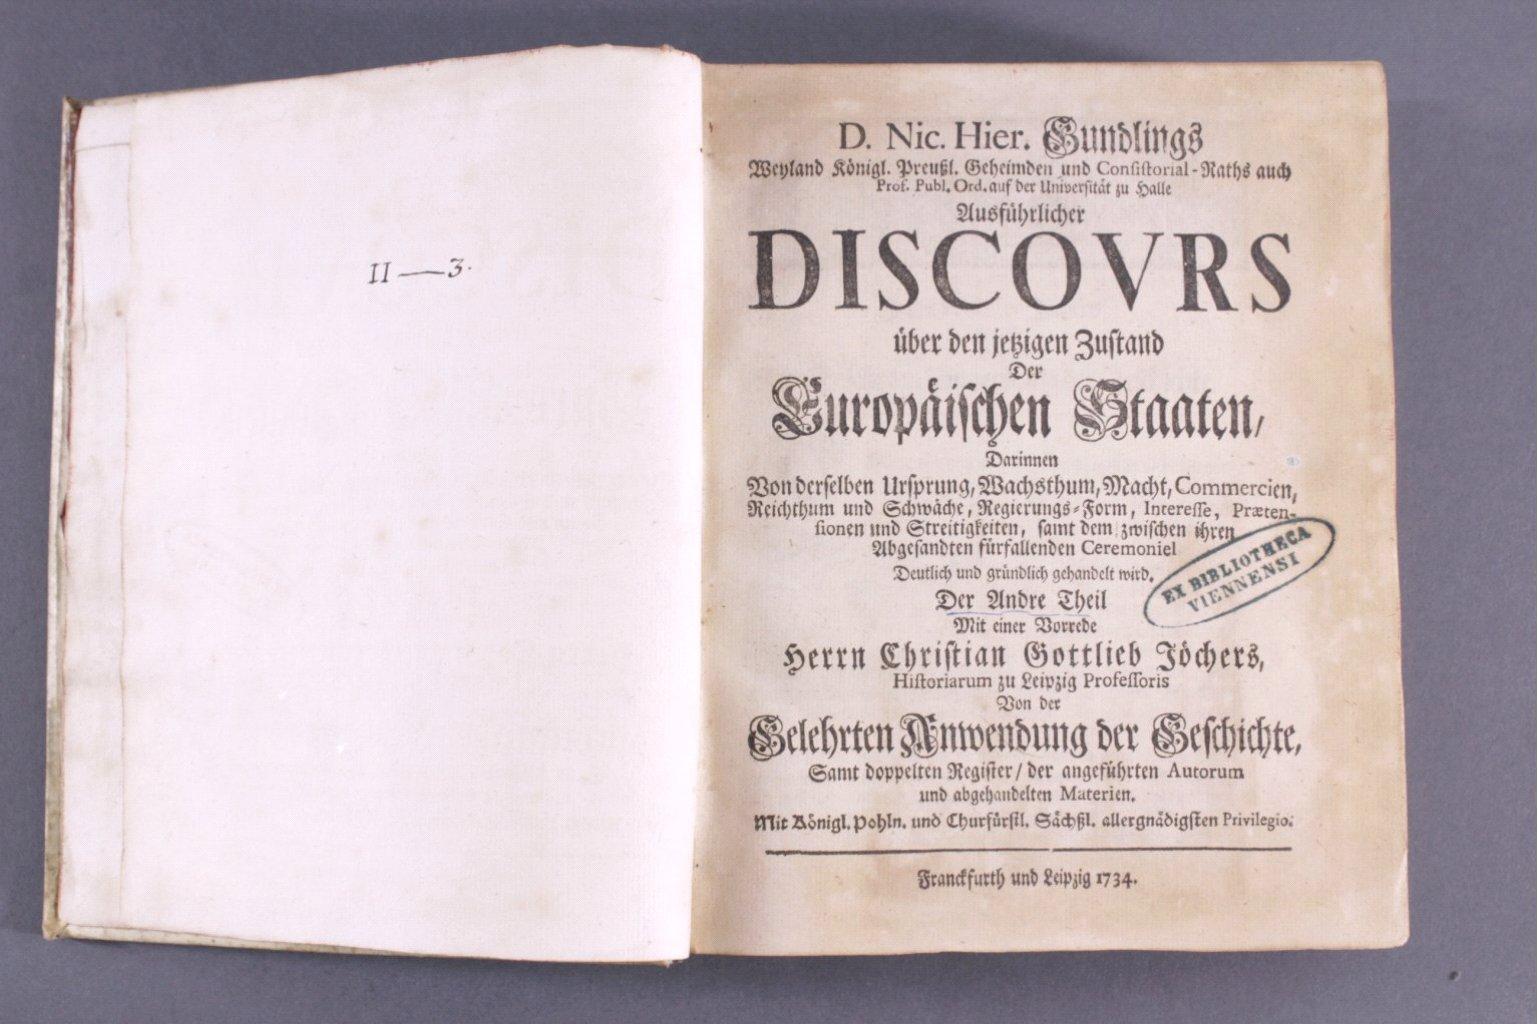 D. Nic. Hier Gundlings Discours, 1734-2